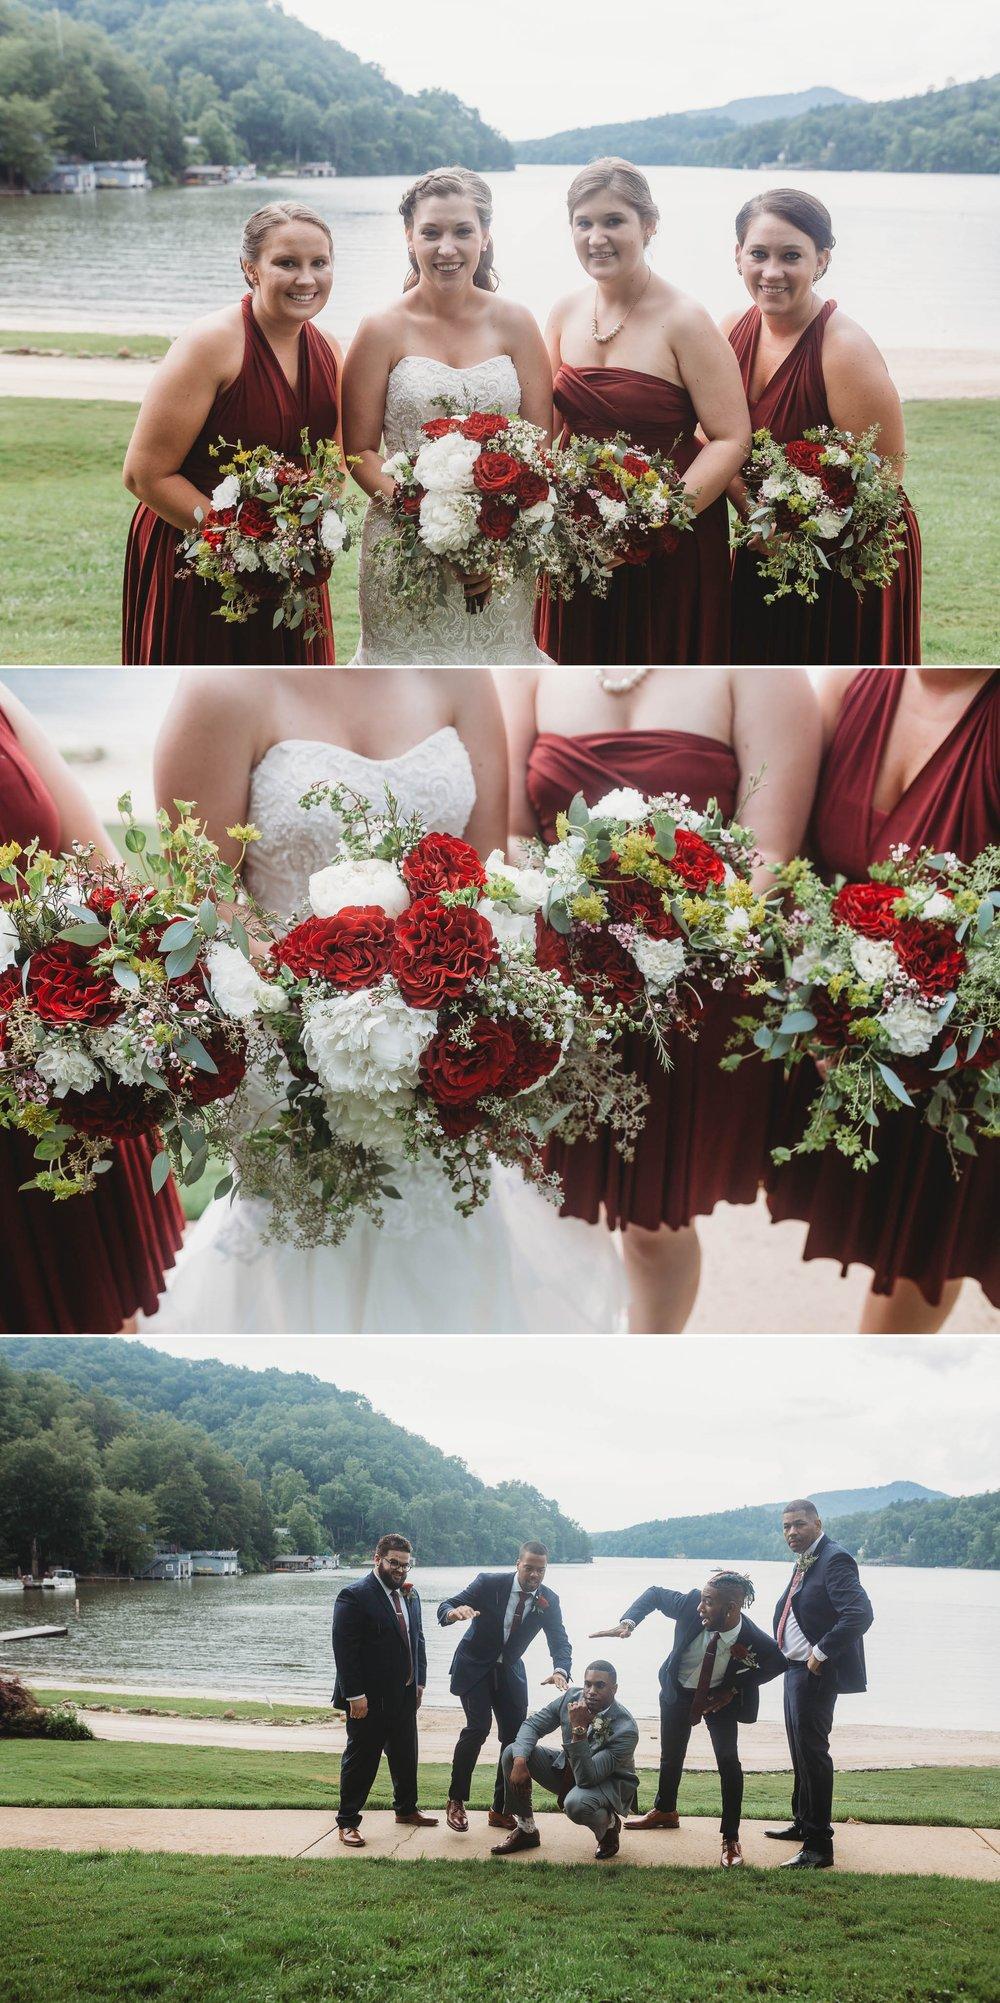 Bridesmaids and Groomsmen Formals - Rachel + Jamison - Rumbling Bald Resort, Lake Lure, NC - Asheville, North Carolina Wedding Photographer